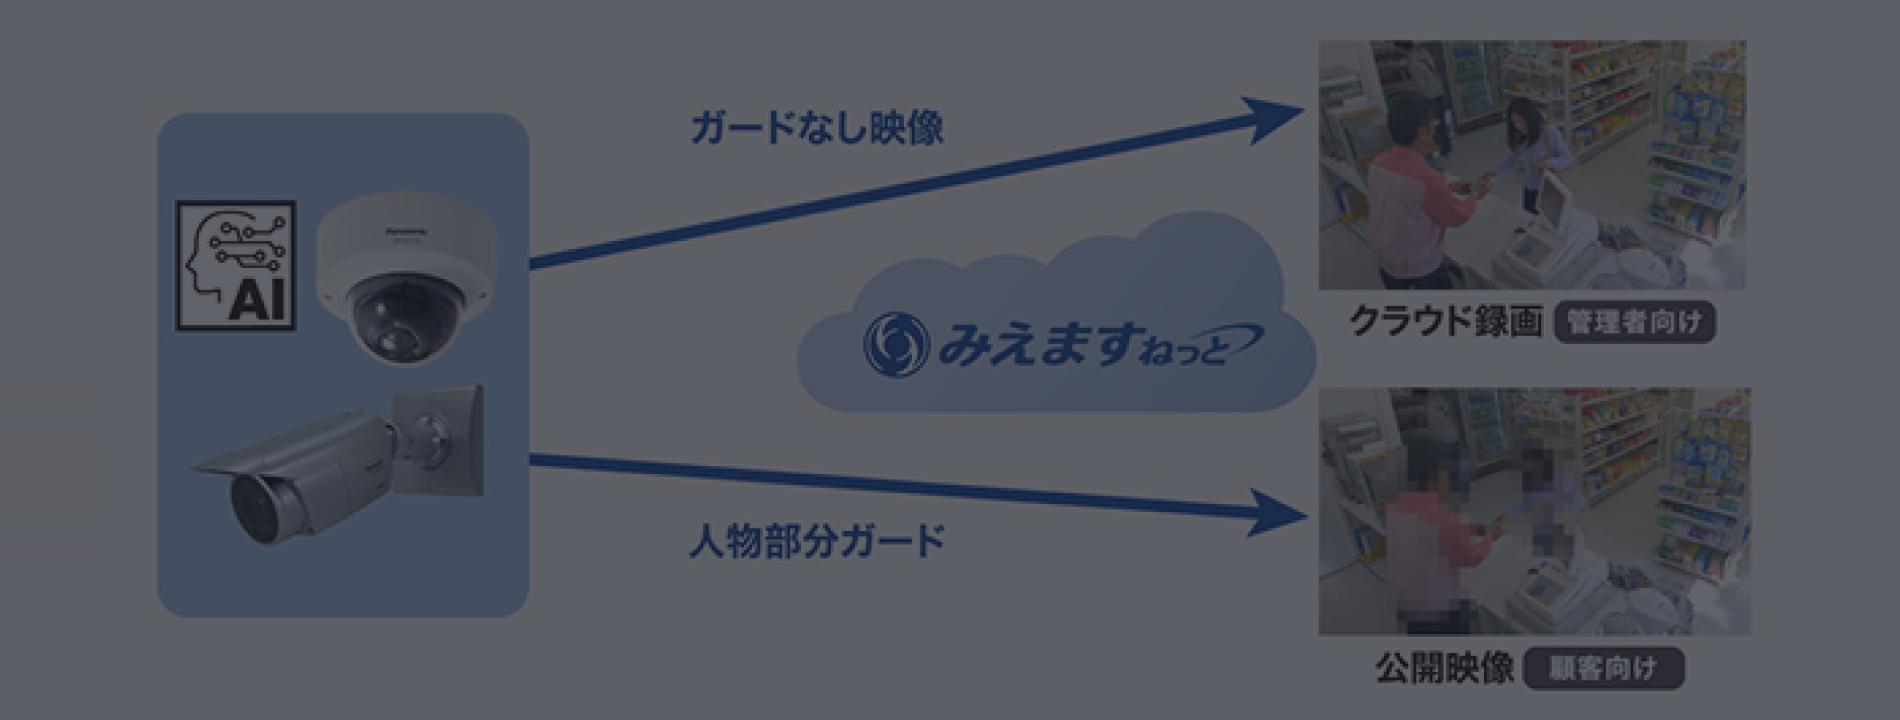 2102_NewsRelease_MiemasuAI_img_1900x720